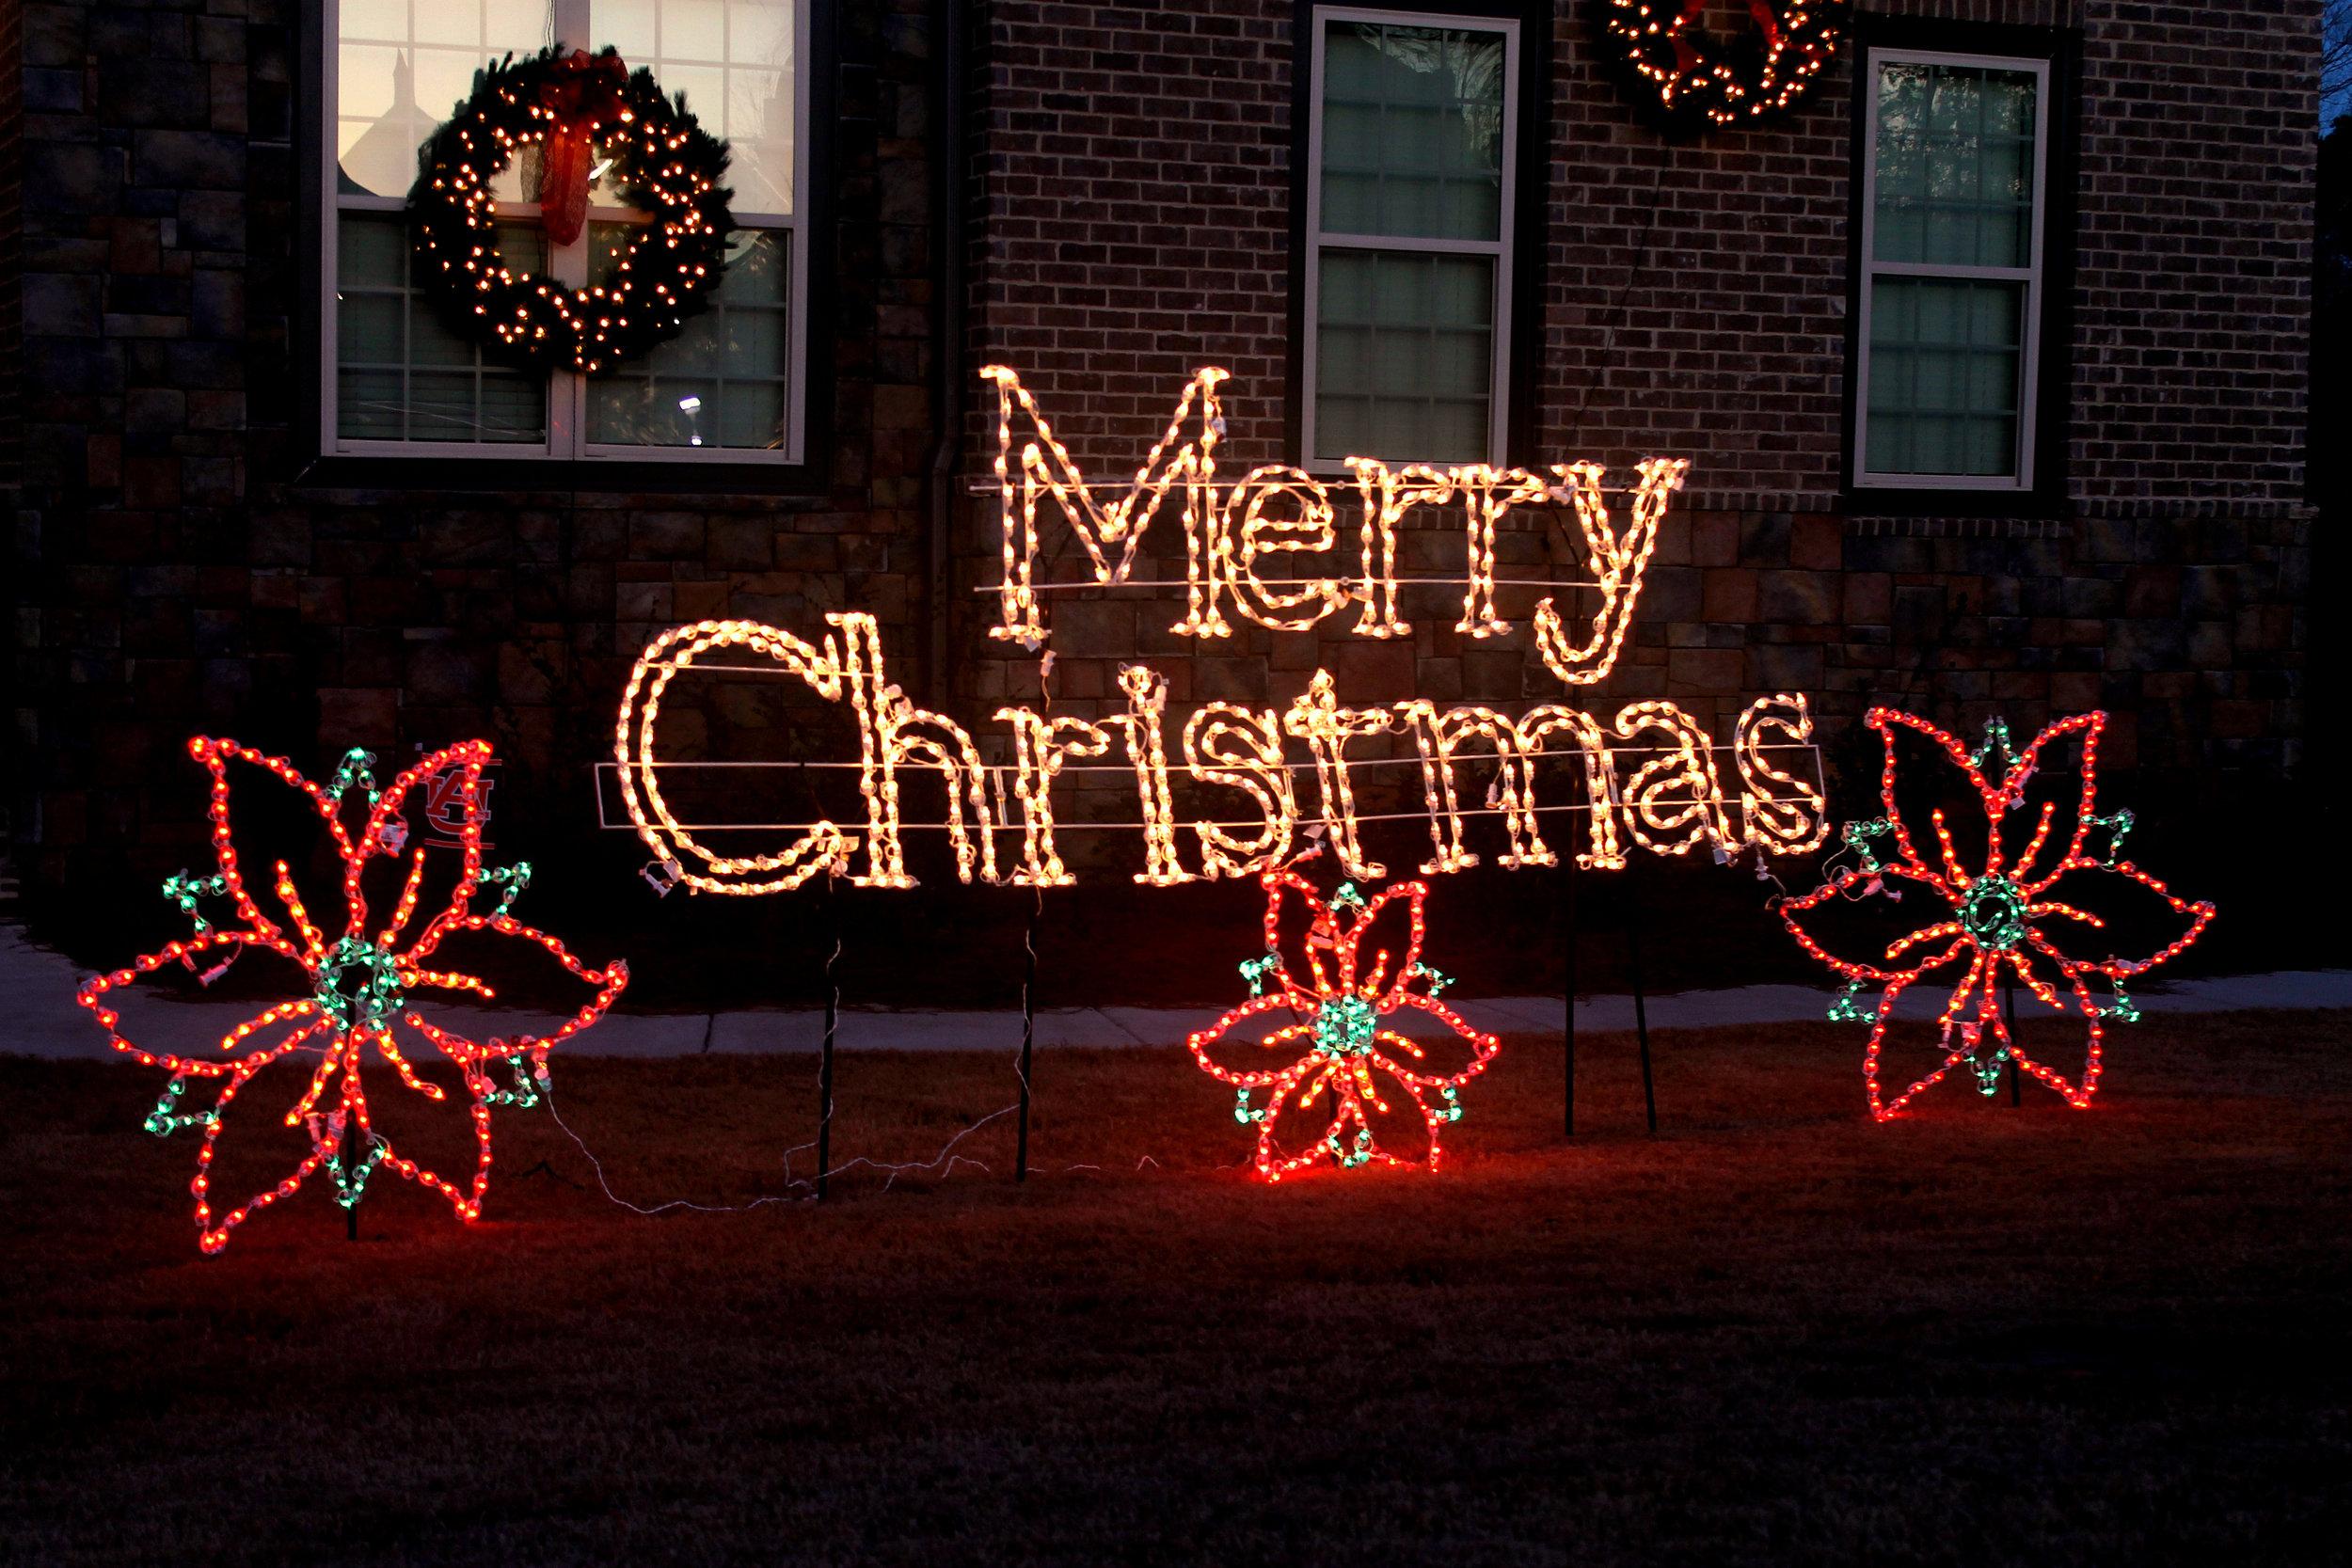 glitter and glow chrismas decor residential exterior (20).jpg